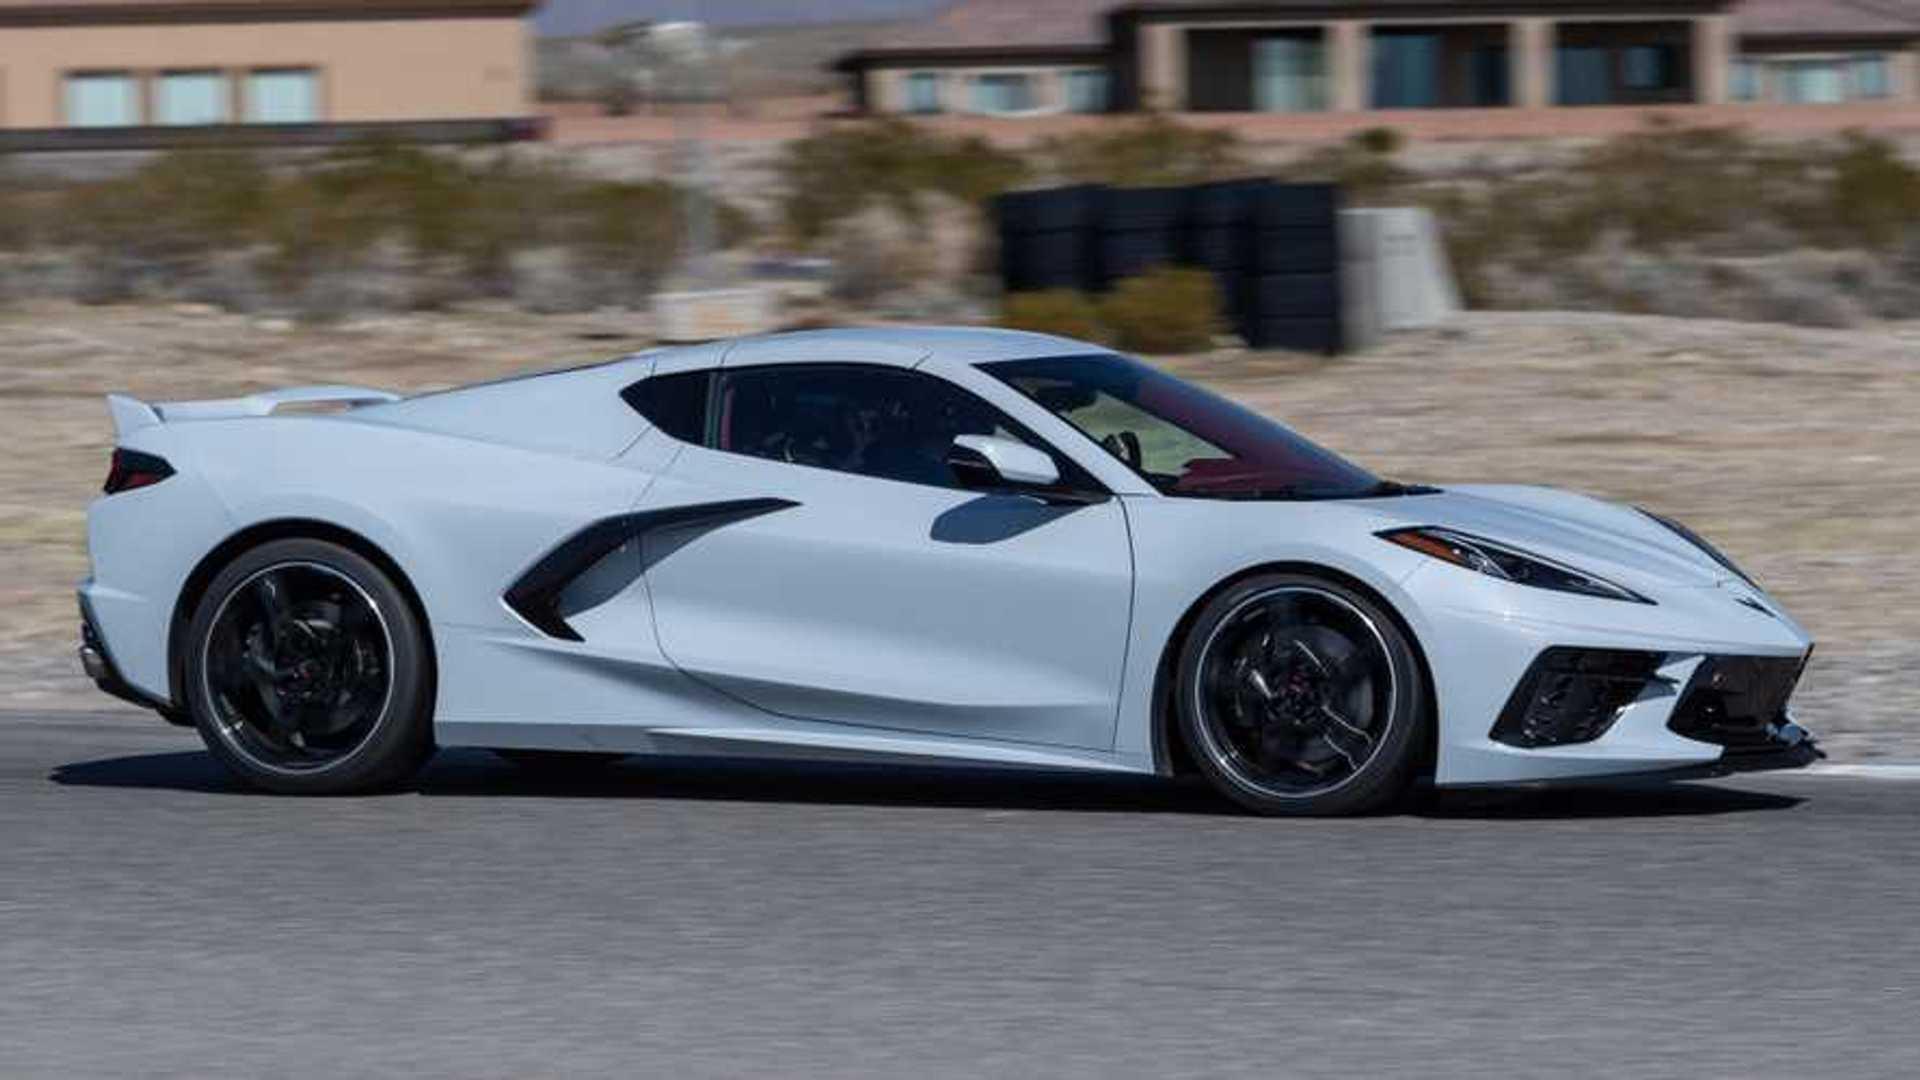 2020 Corvette Z07 Redesign